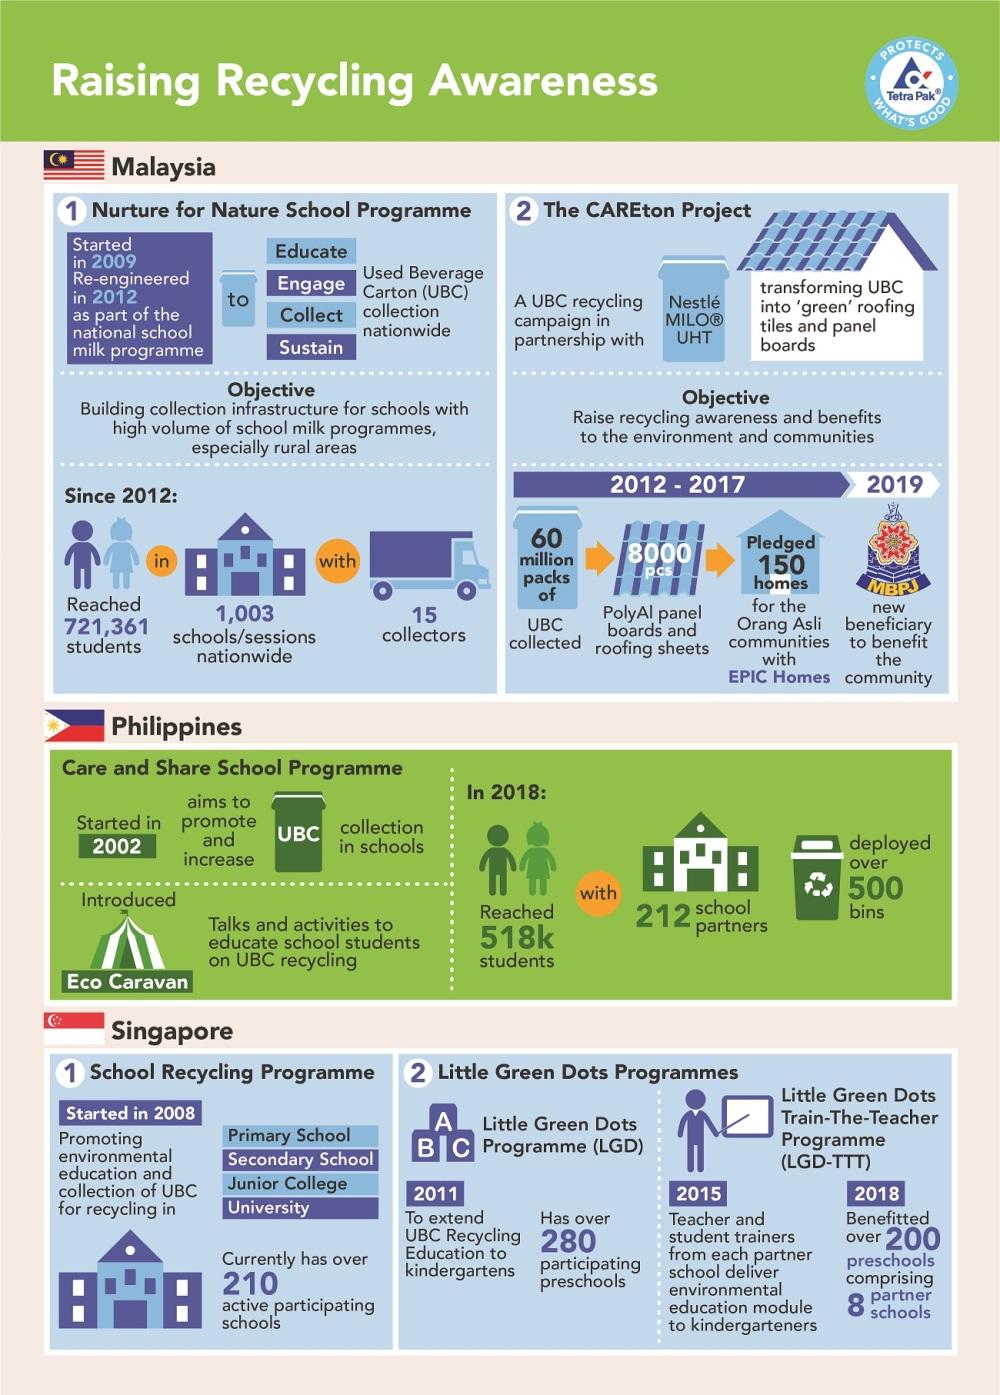 Tetra Pak Malaysia Singapore Philippines_Recycling Awareness (1)